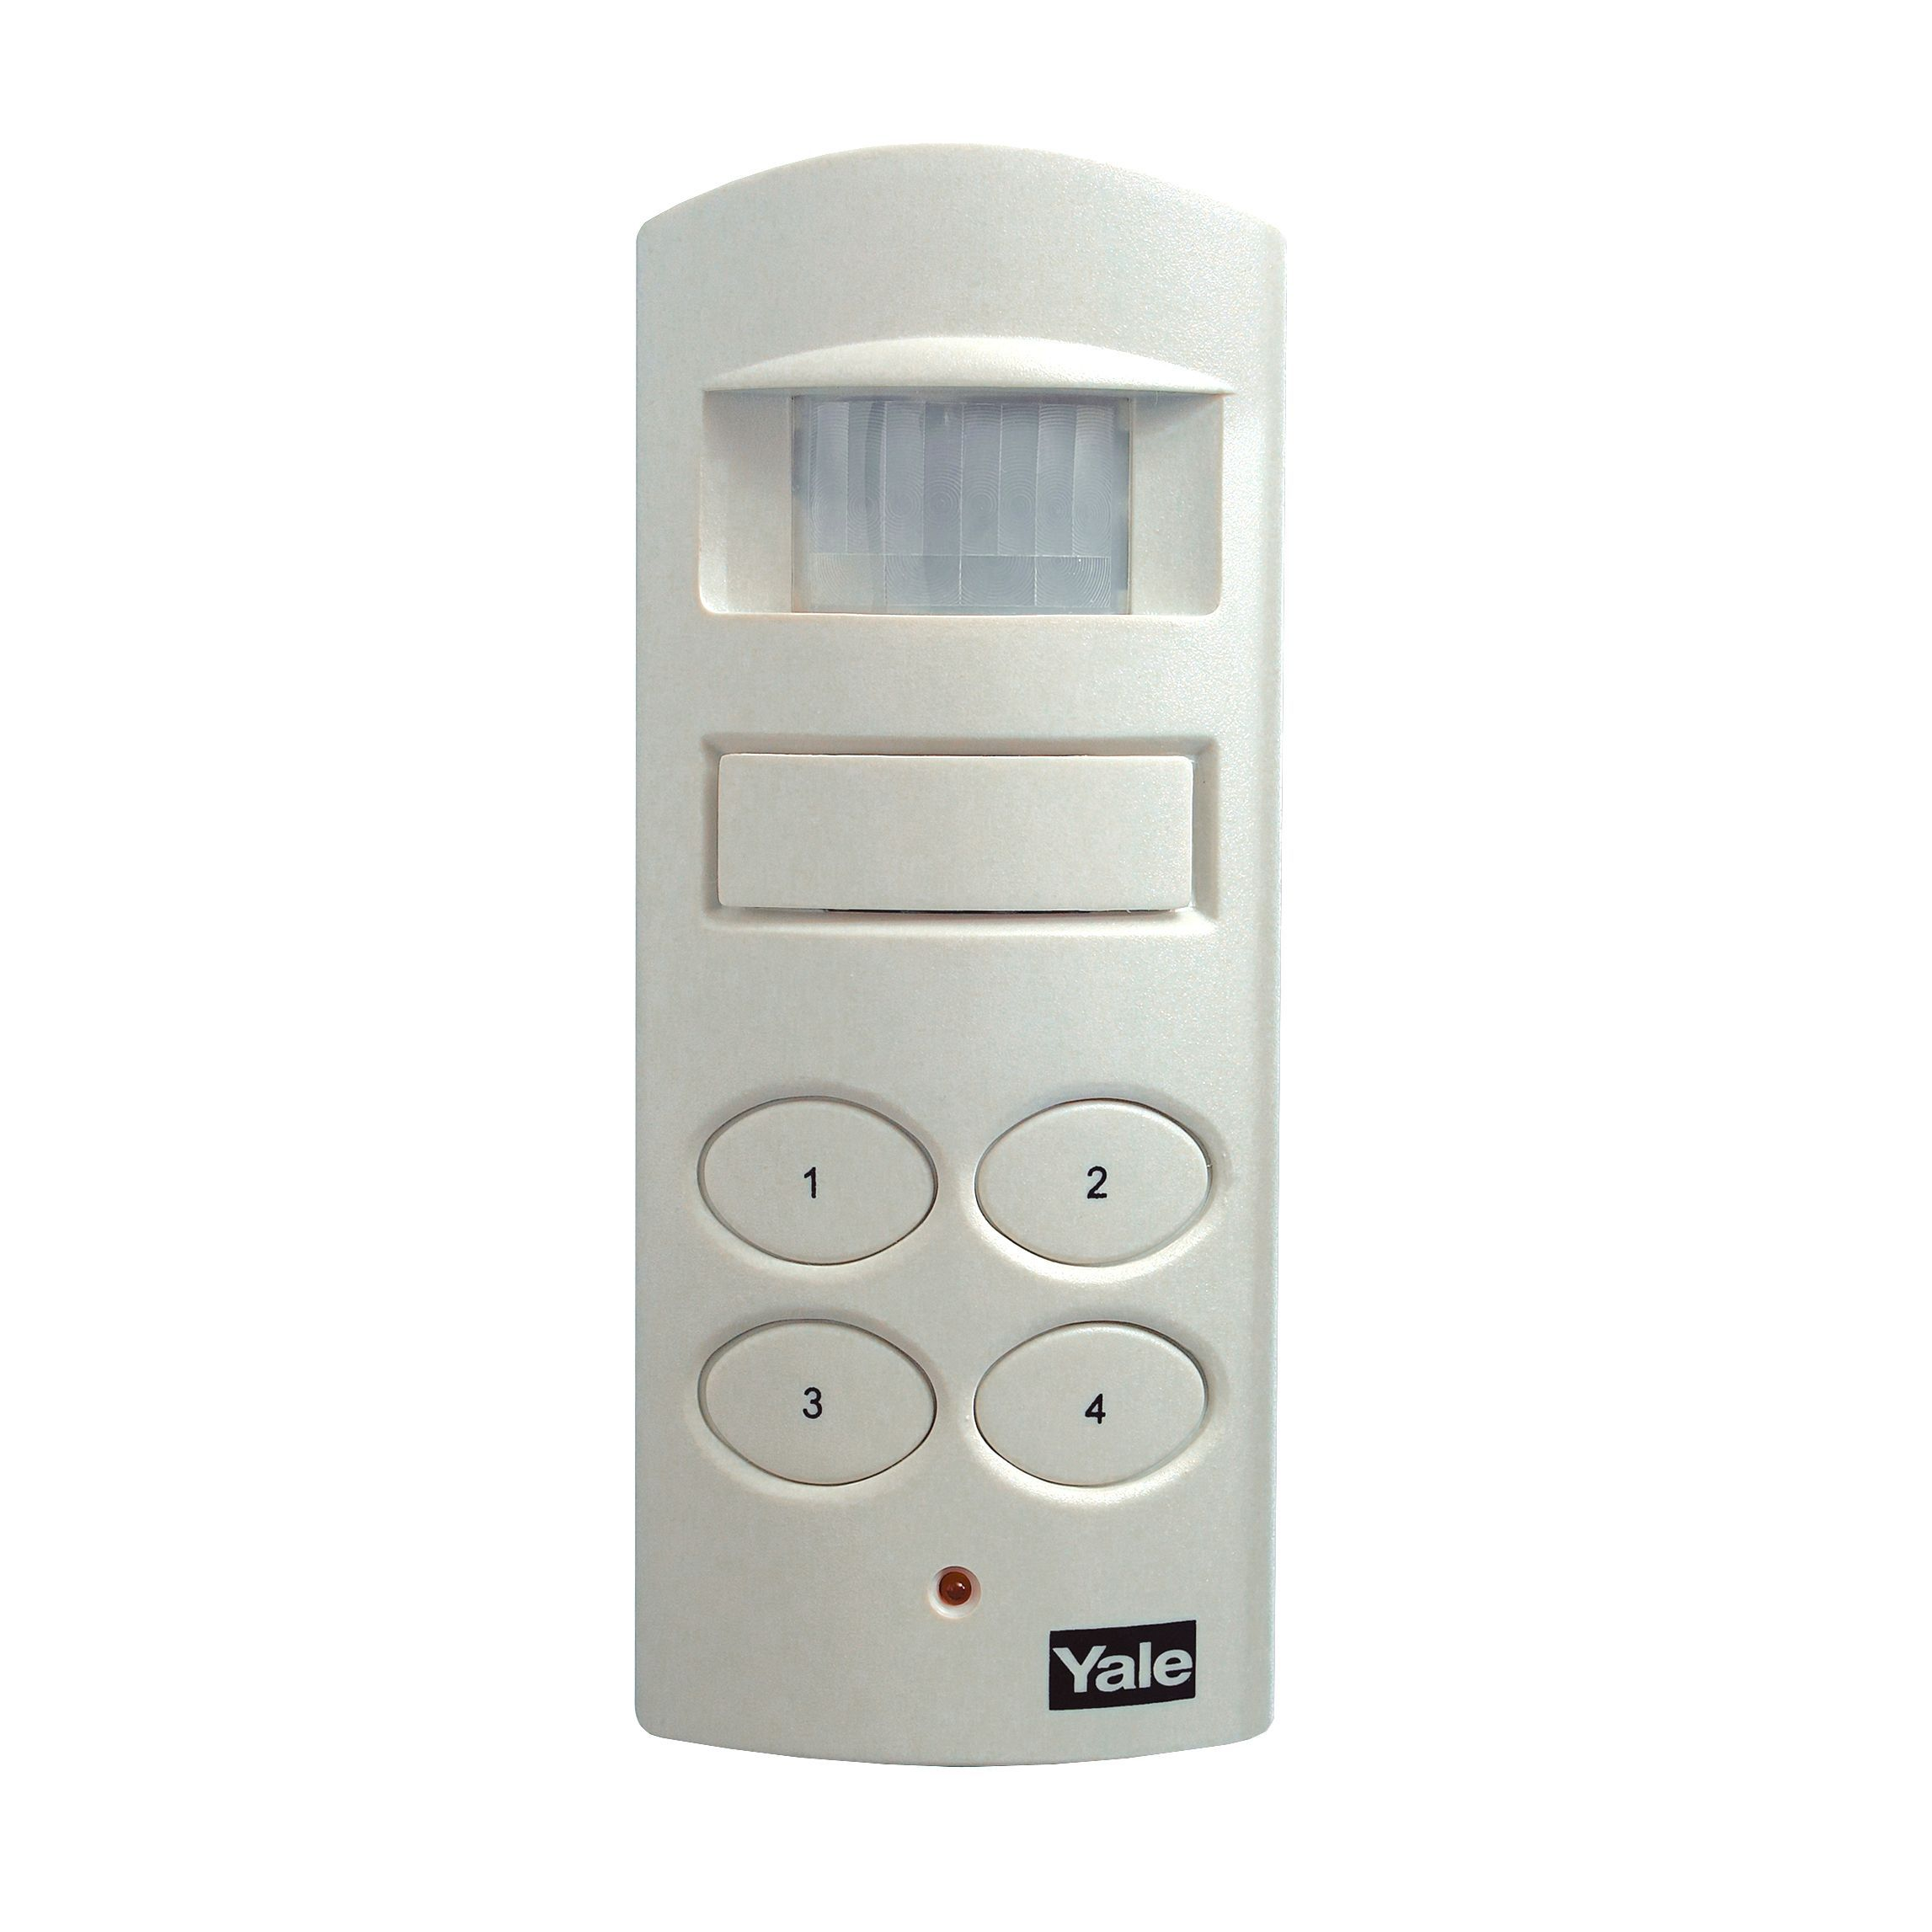 Yale Wireless Shed Amp Garage Alarm Departments Diy At B Amp Q